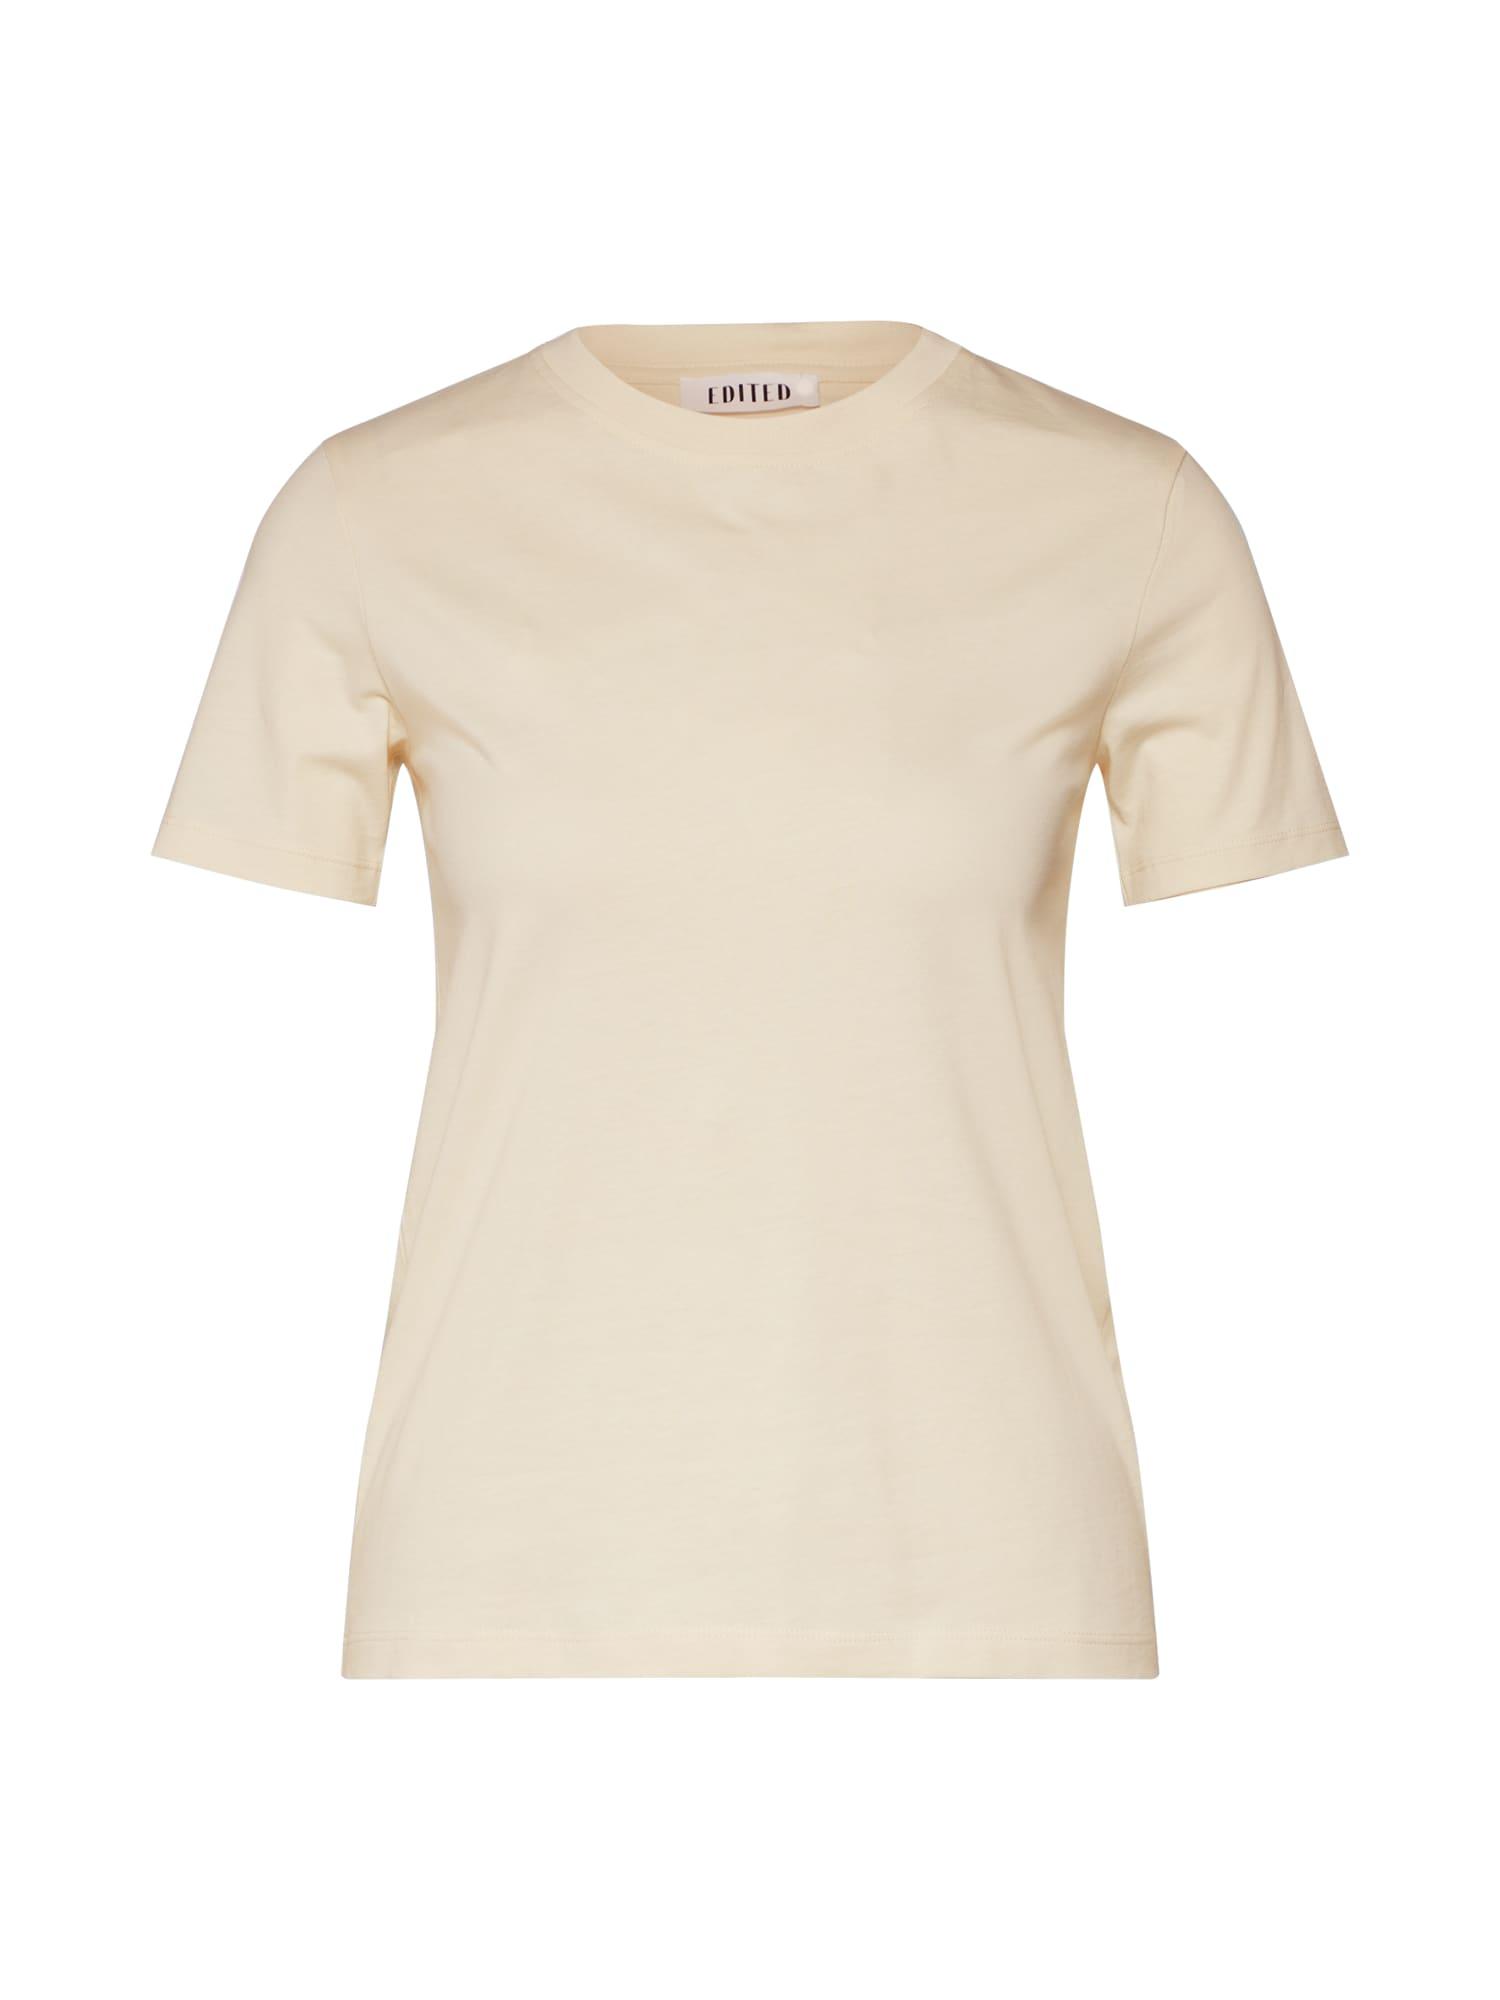 Tričko Leila béžová EDITED